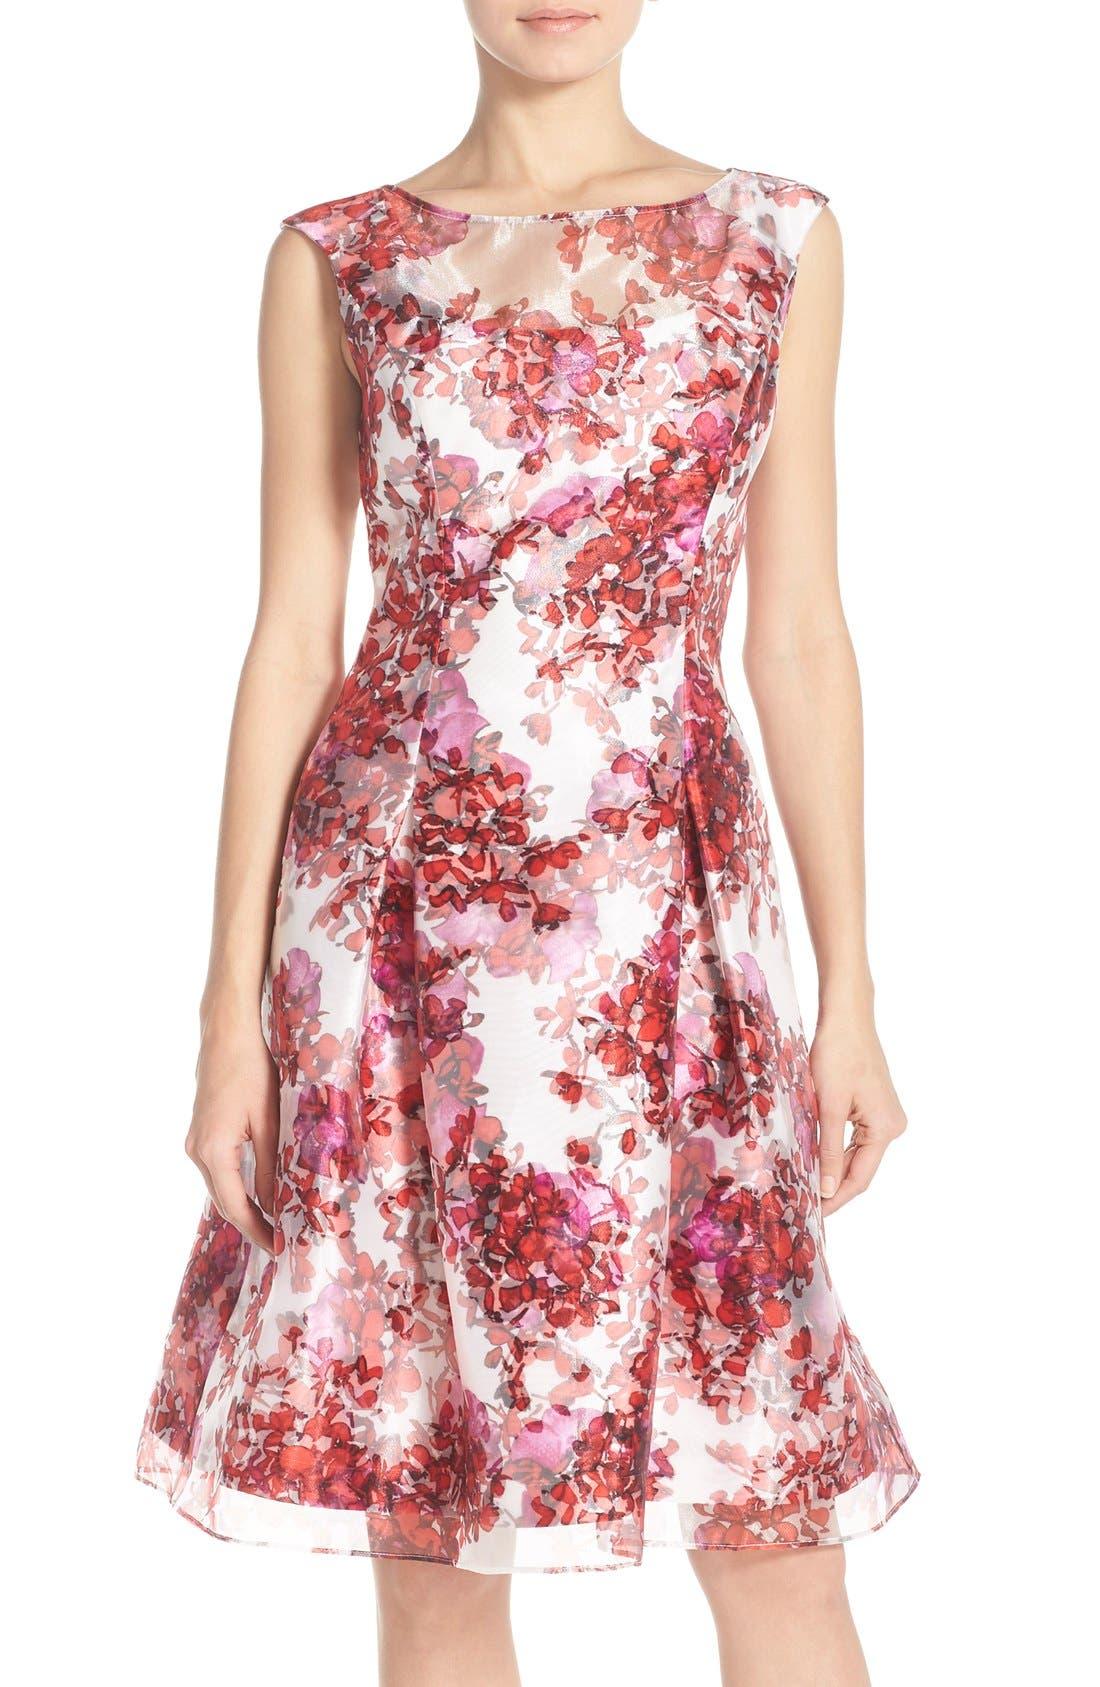 Alternate Image 1 Selected - Aidan Mattox Organza Overlay Fit & Flare Dress